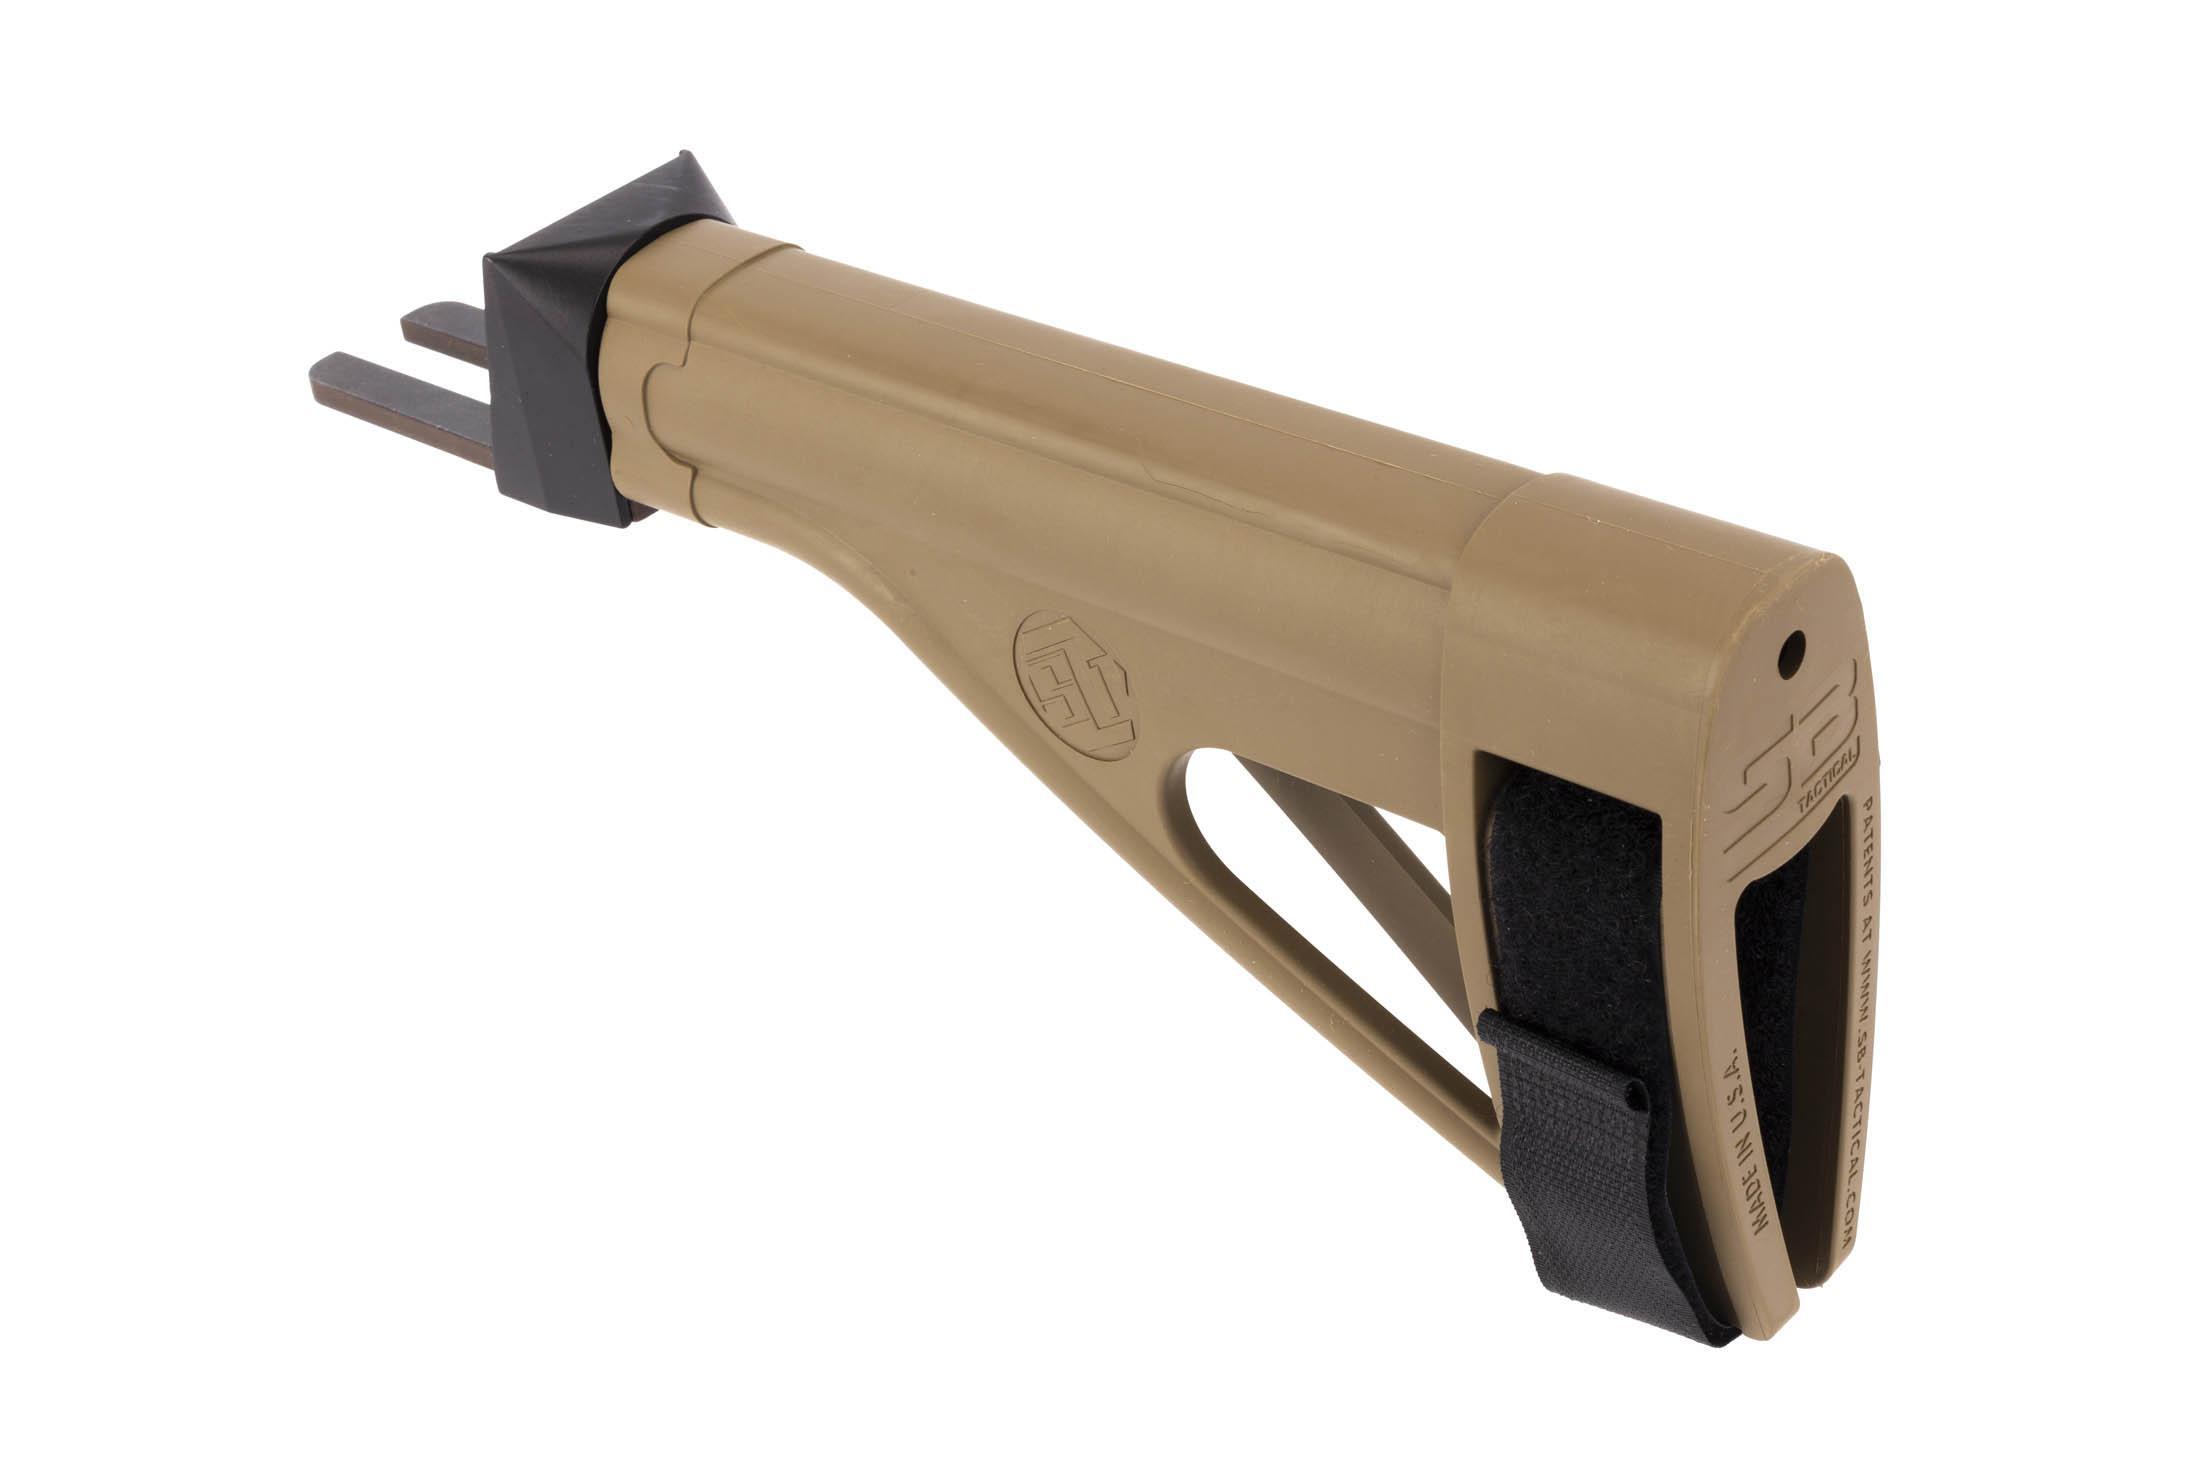 SB Tactical SOB47 AK Pistol Stabilizing Brace - Flat Dark Earth